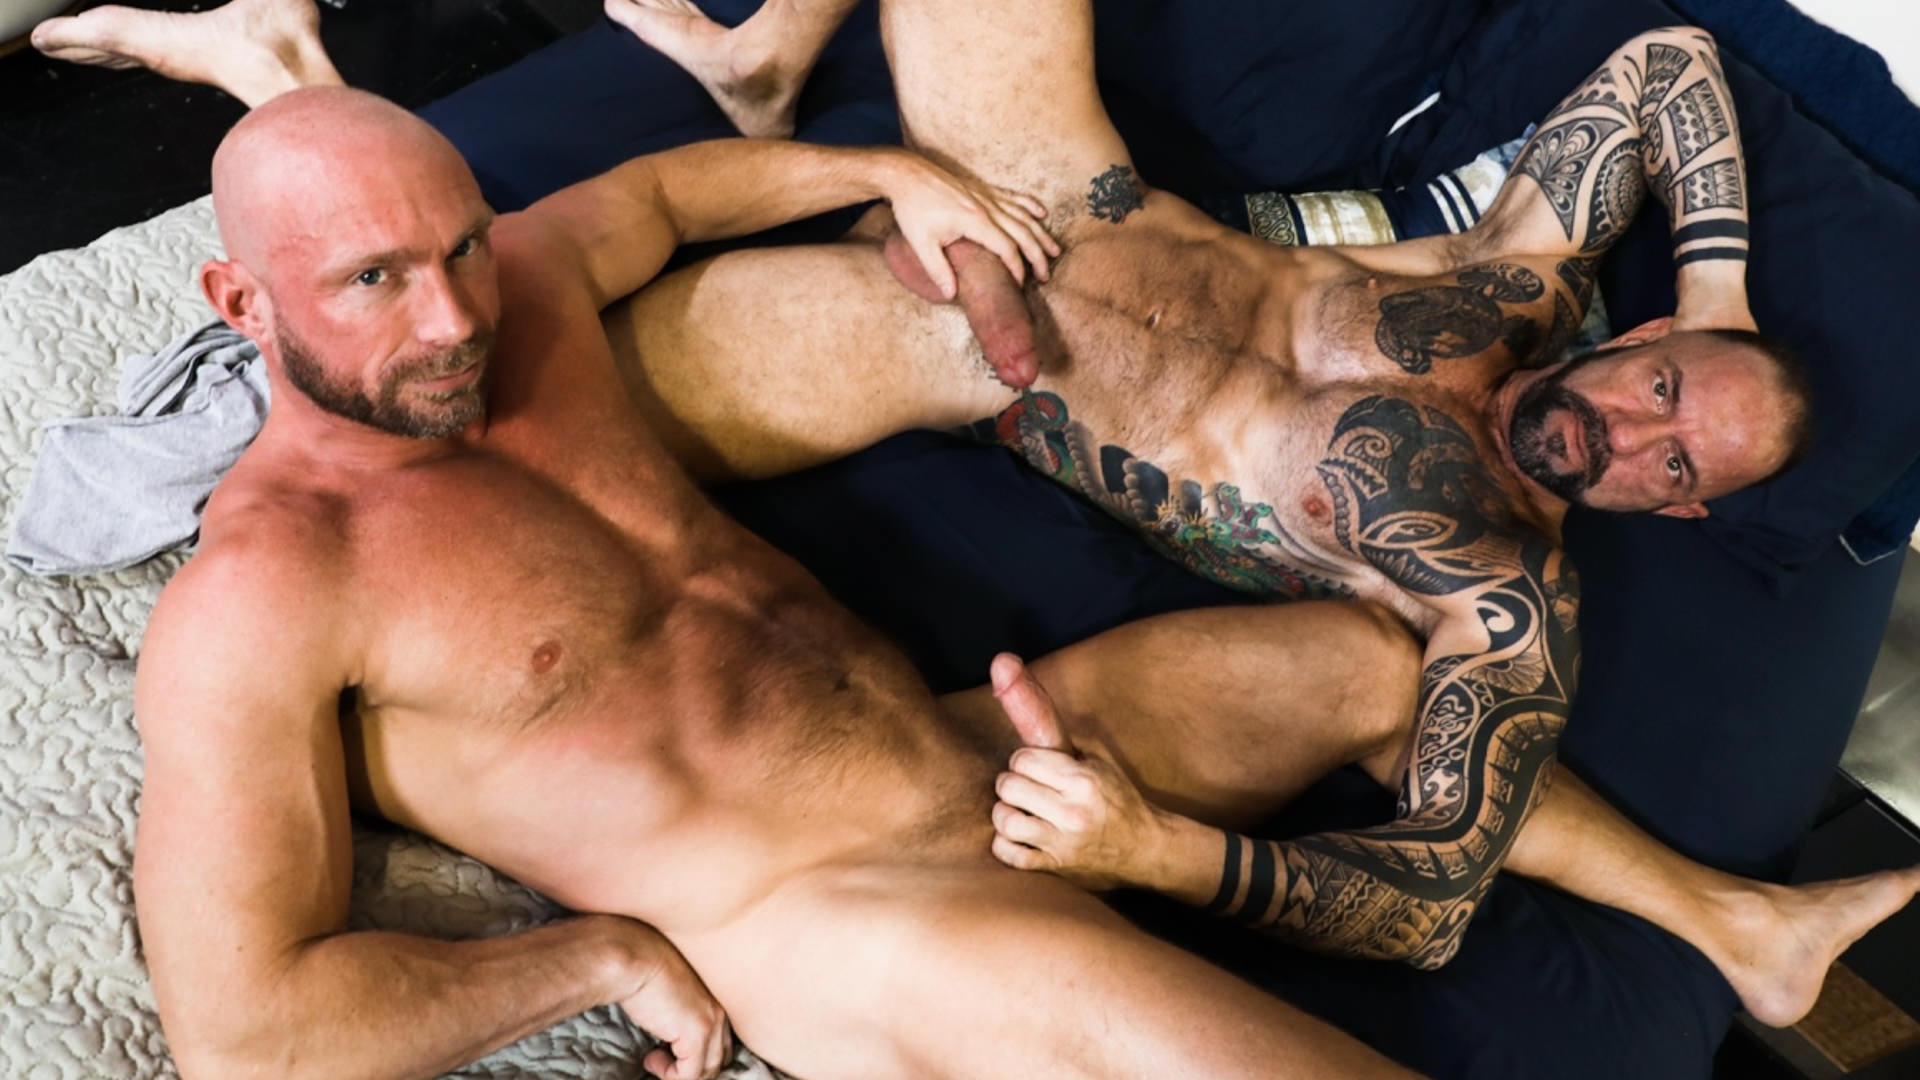 Men for Men Blog 74497_01_01 Hairy hunks fucking Vic Rocco drives his big cock deep inside Killian Knox's smooth bubble ass Extra Big Dicks